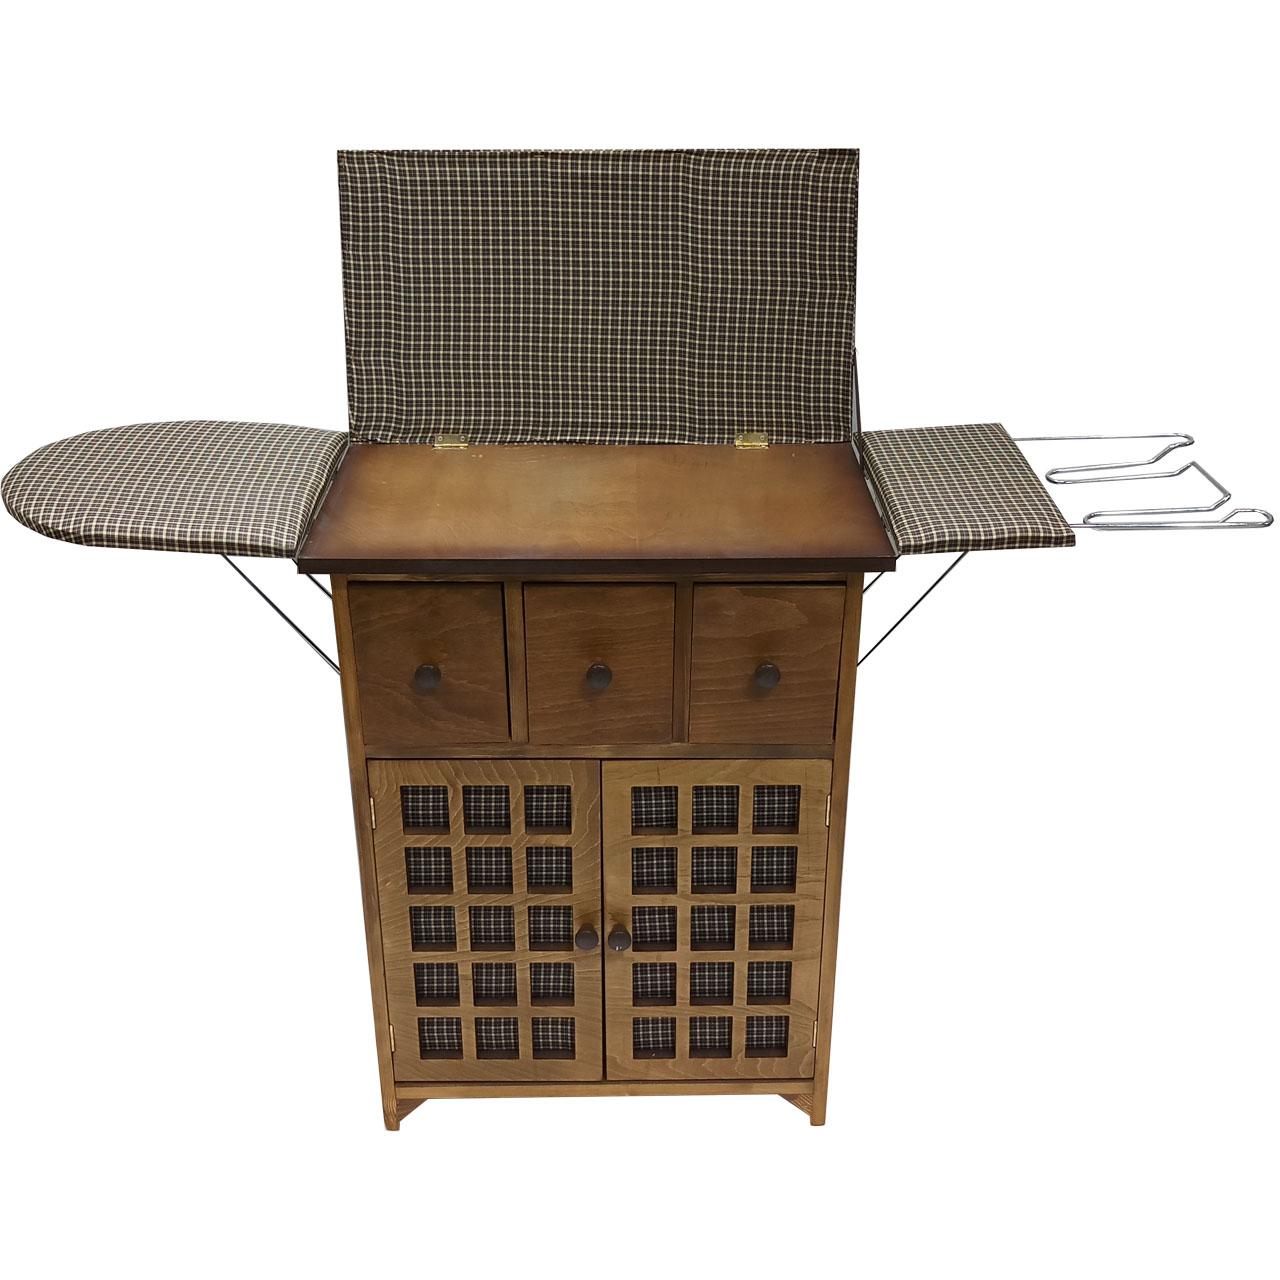 میز اتو و چرخ خیاطی طرح لپ تاپ مدل 95300w